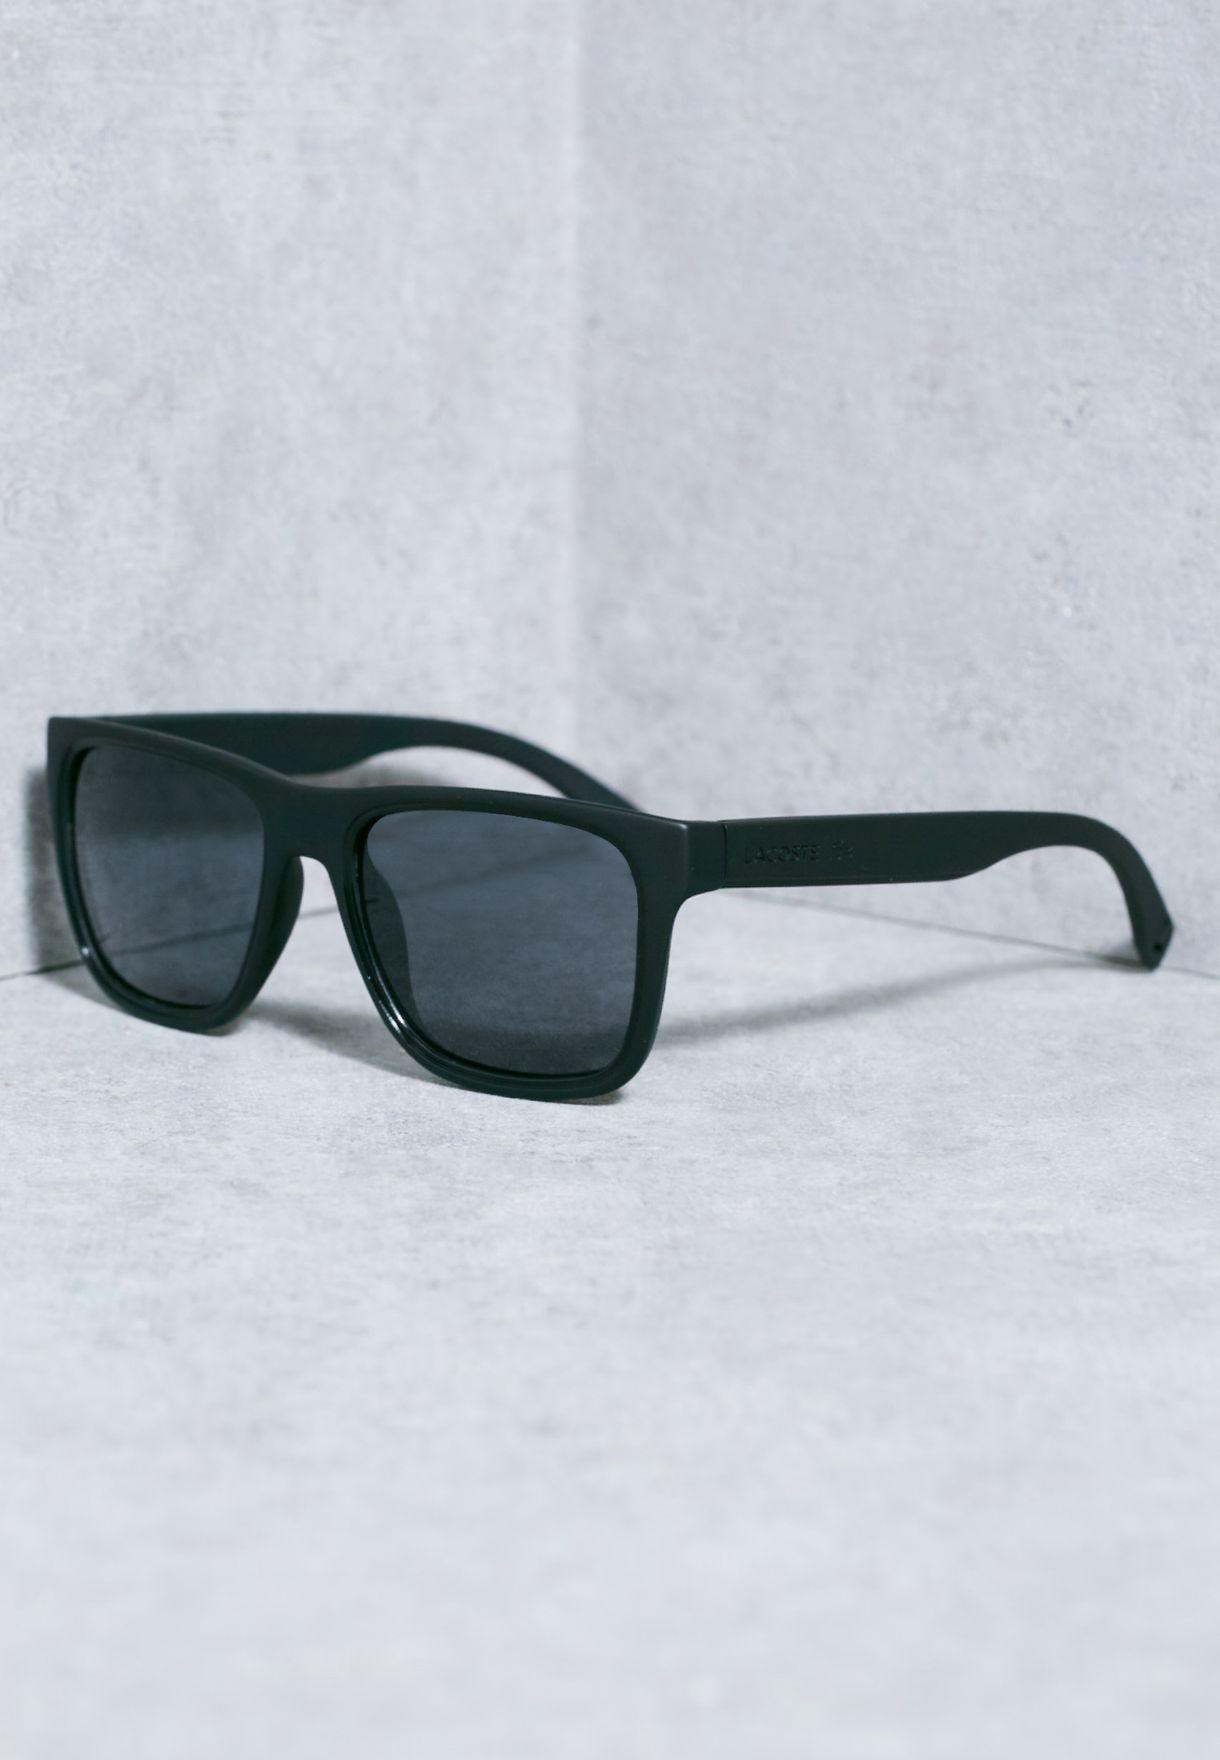 0b80beea7 تسوق نظارة شمسية واي فيرر ماركة لاكوست لون أسود L816S-001 في قطر ...